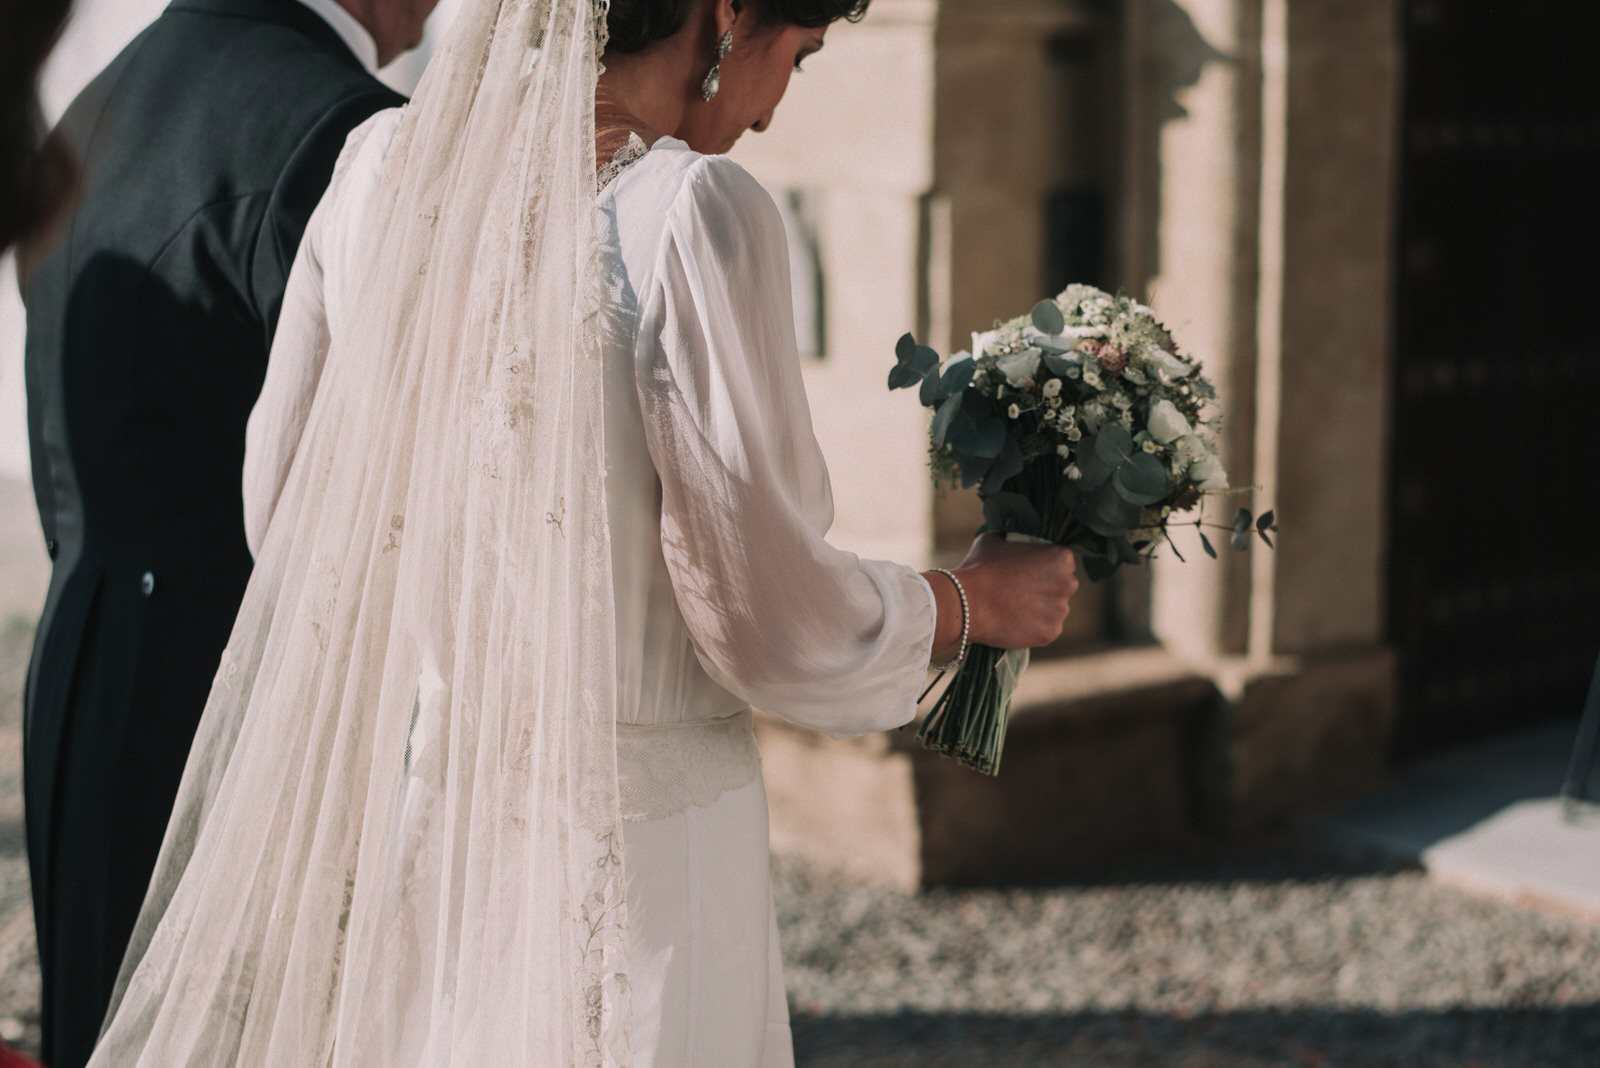 fotografo de bodas sevilla - fotografo boda - fotografía sevilla - Andrés AmarilloAAA_4680- tele- fine.JPG